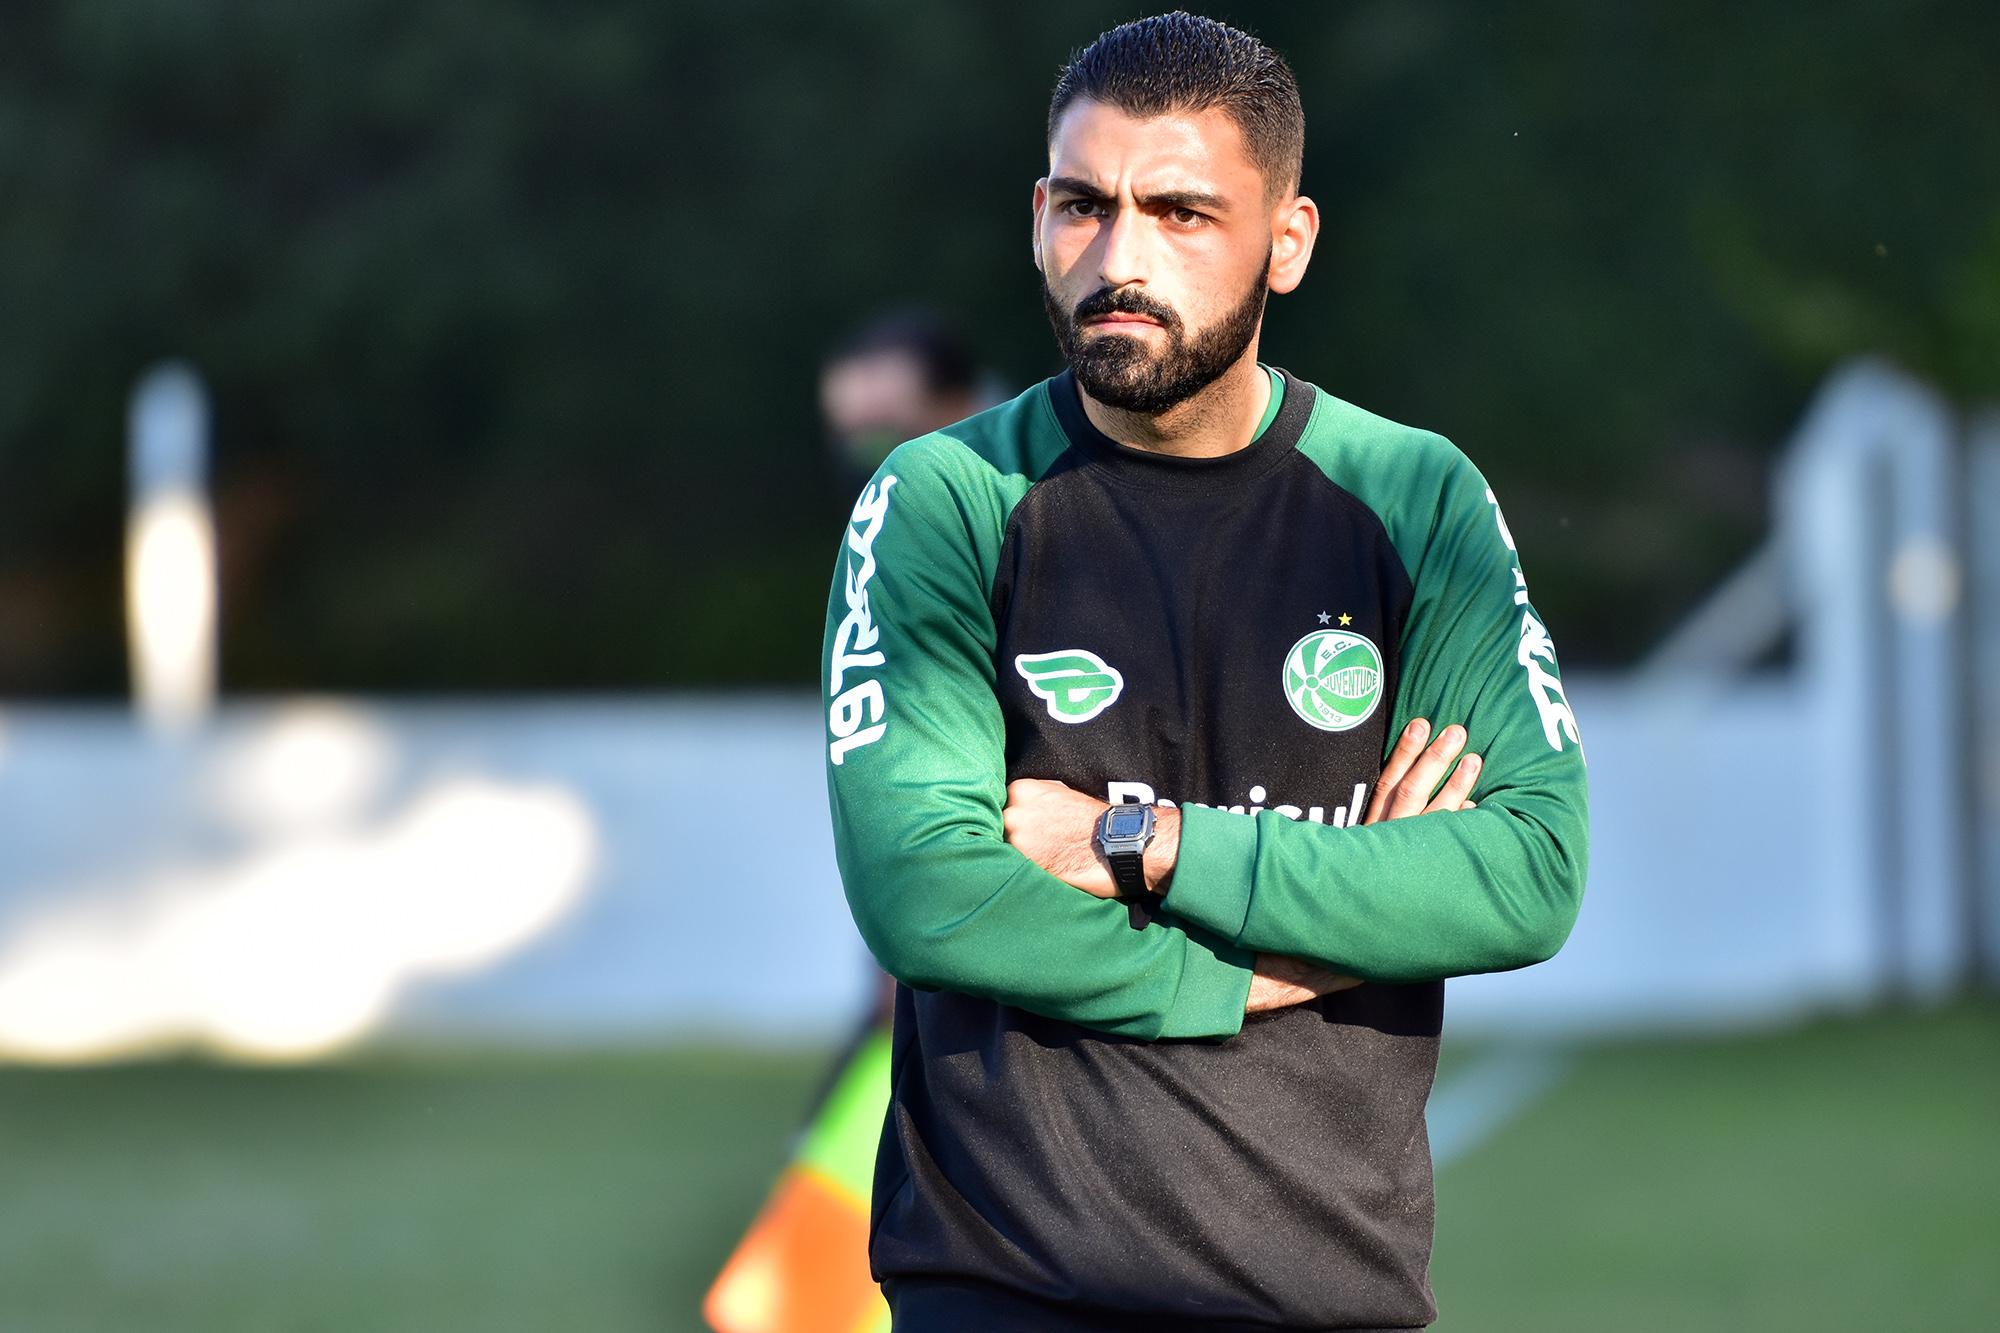 Roberto Maschio deixa o comando das equipes Sub-20 e Sub-23 do Juventude